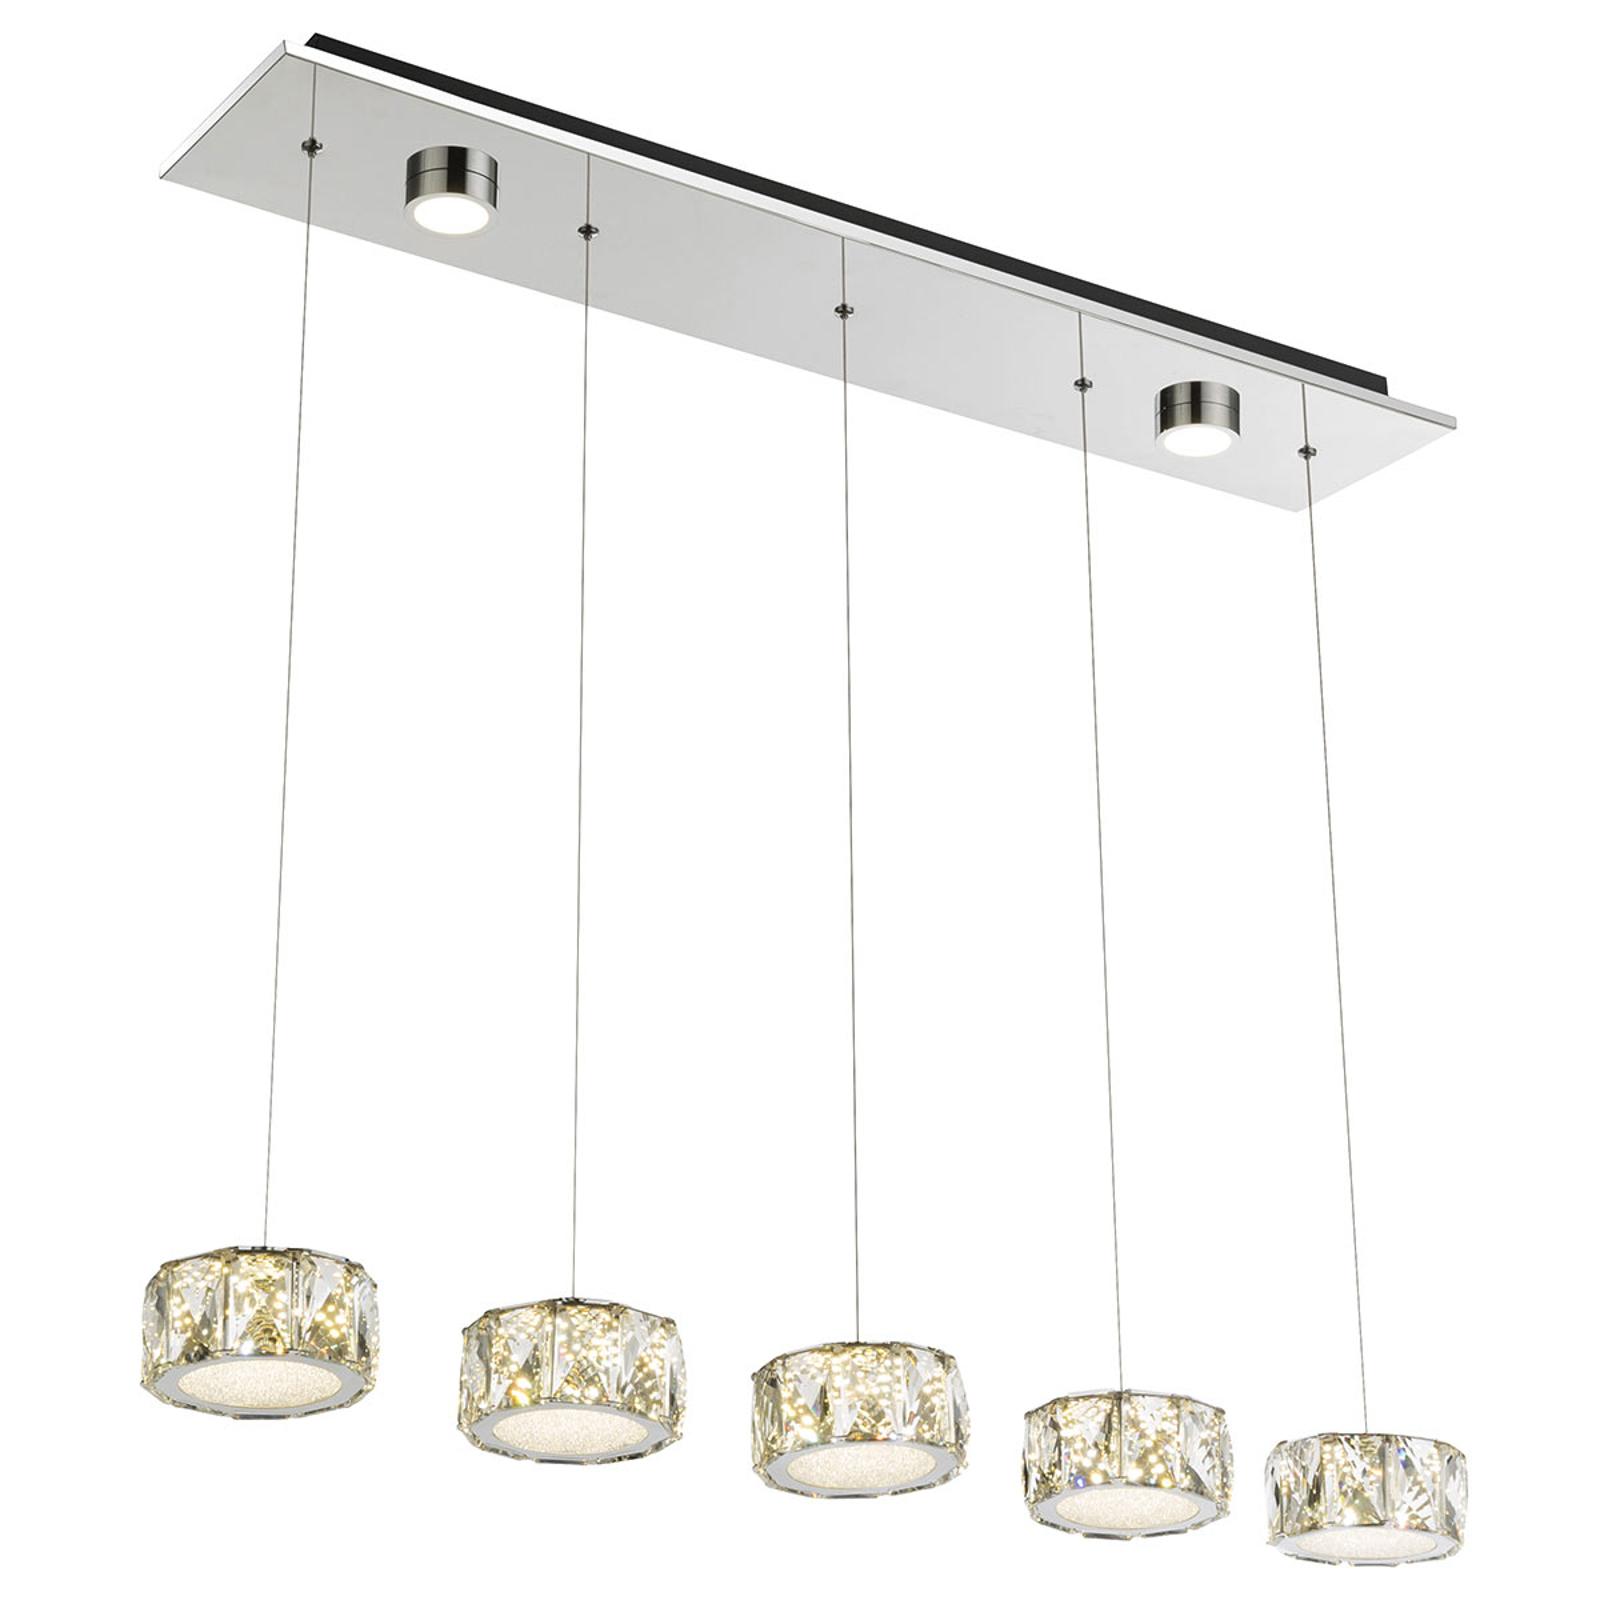 Amur - LED hanglamp 5-lamps met 2 extra spots